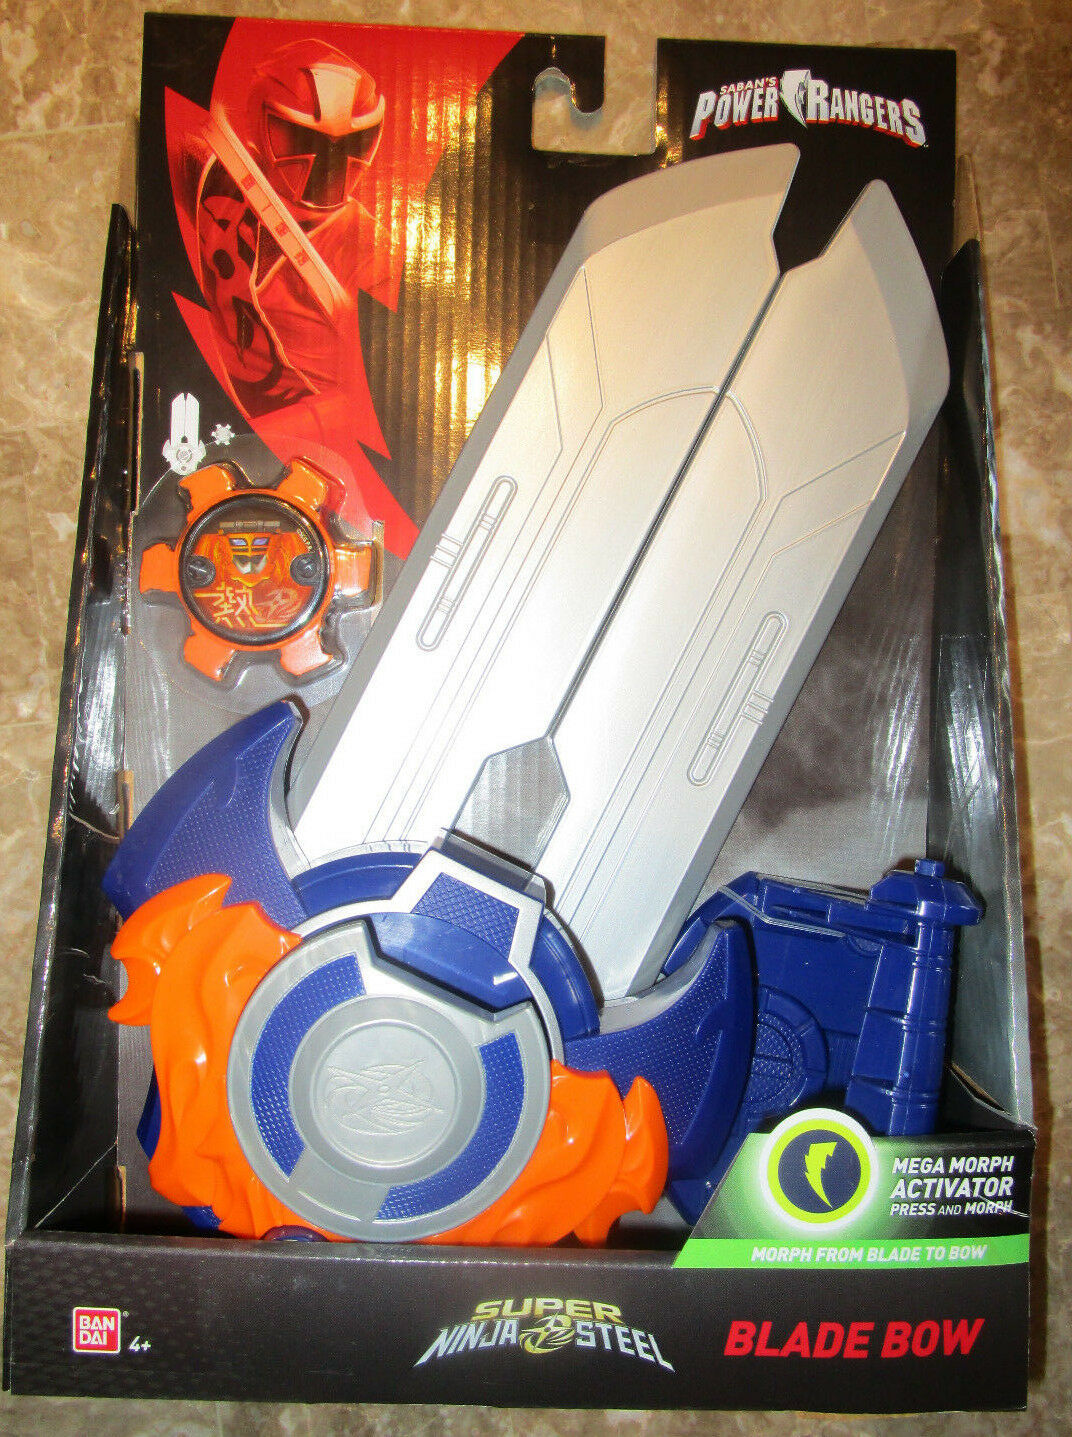 Power rangers super ninja stahl klinge bogen kampf ausrüstung morph - 2018 43826